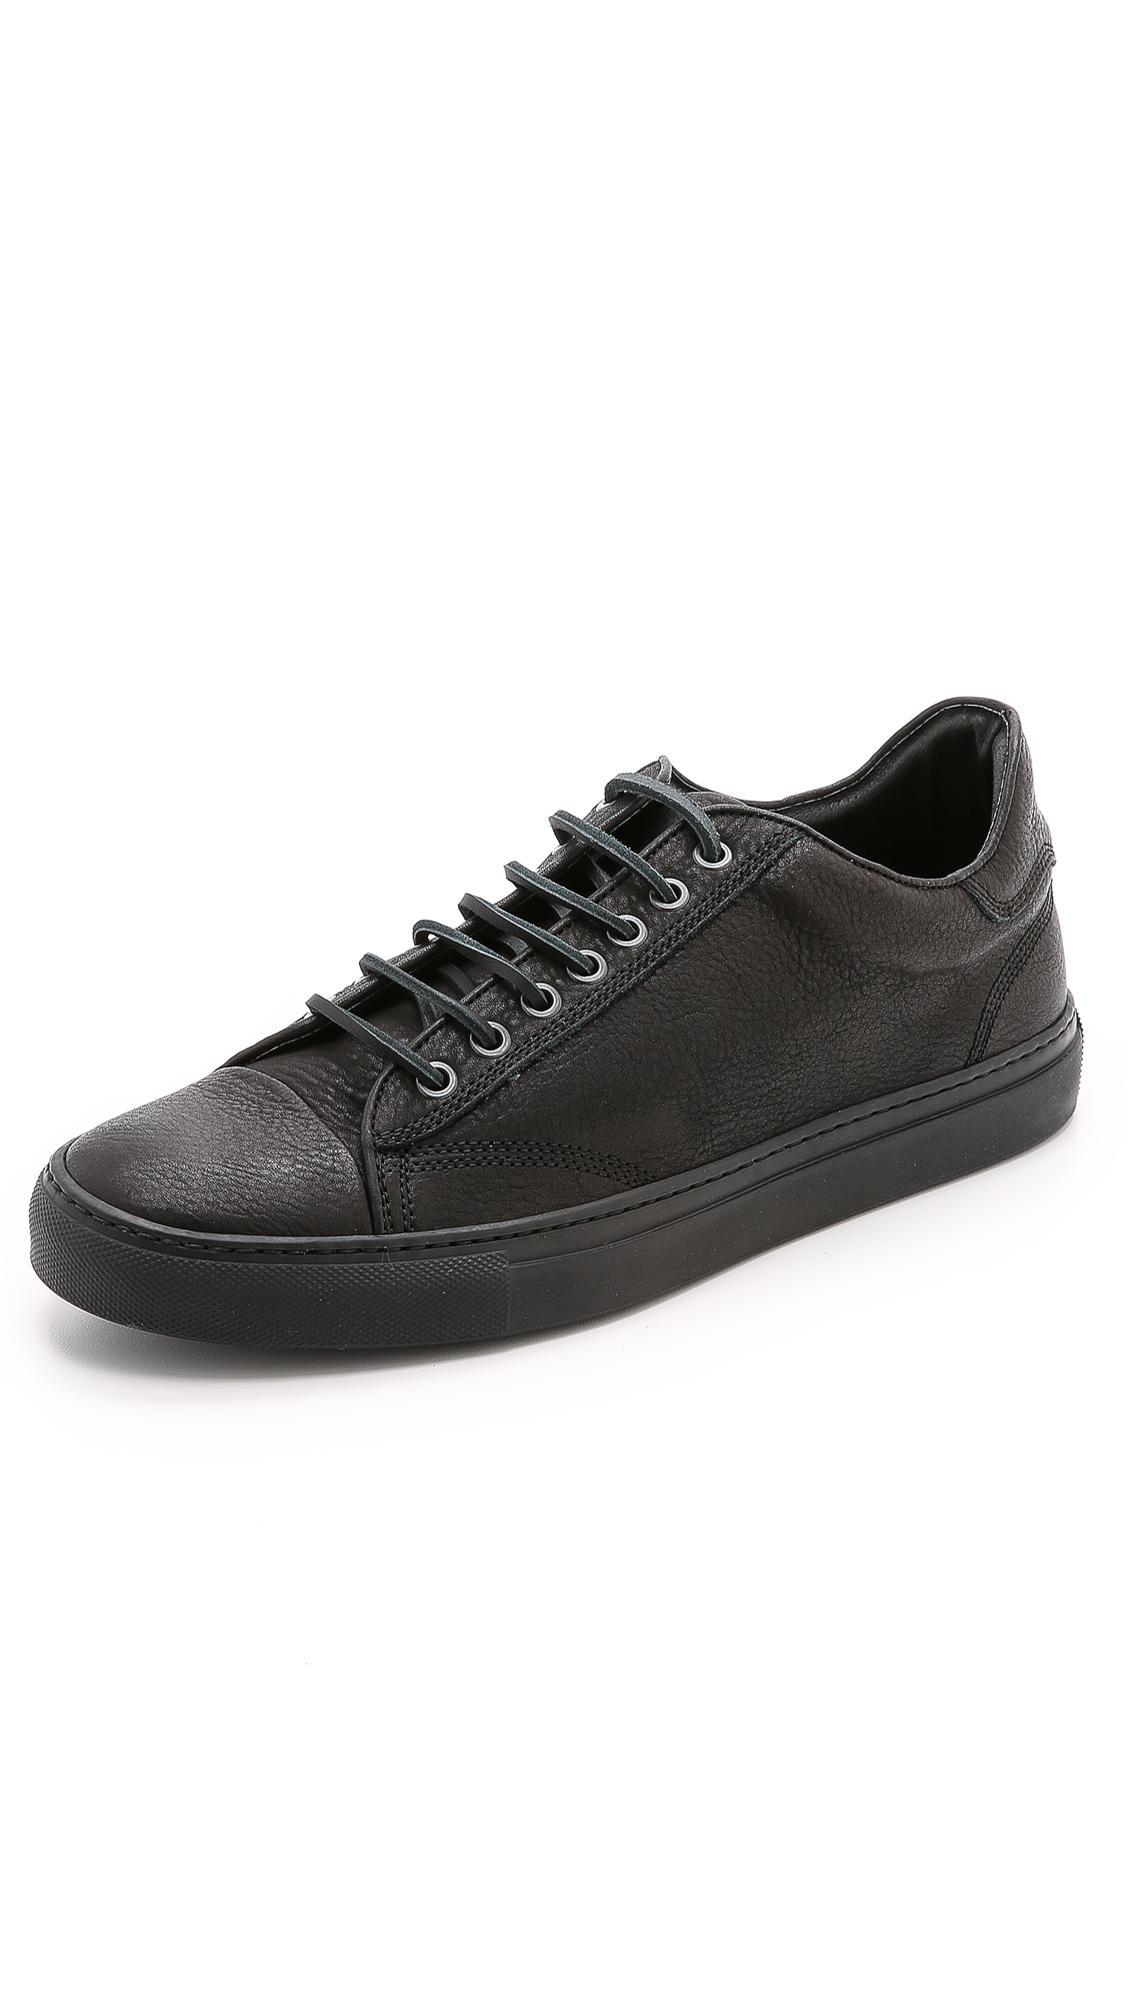 Wings Horns Leather Low Top Sneakers In Black For Men Lyst